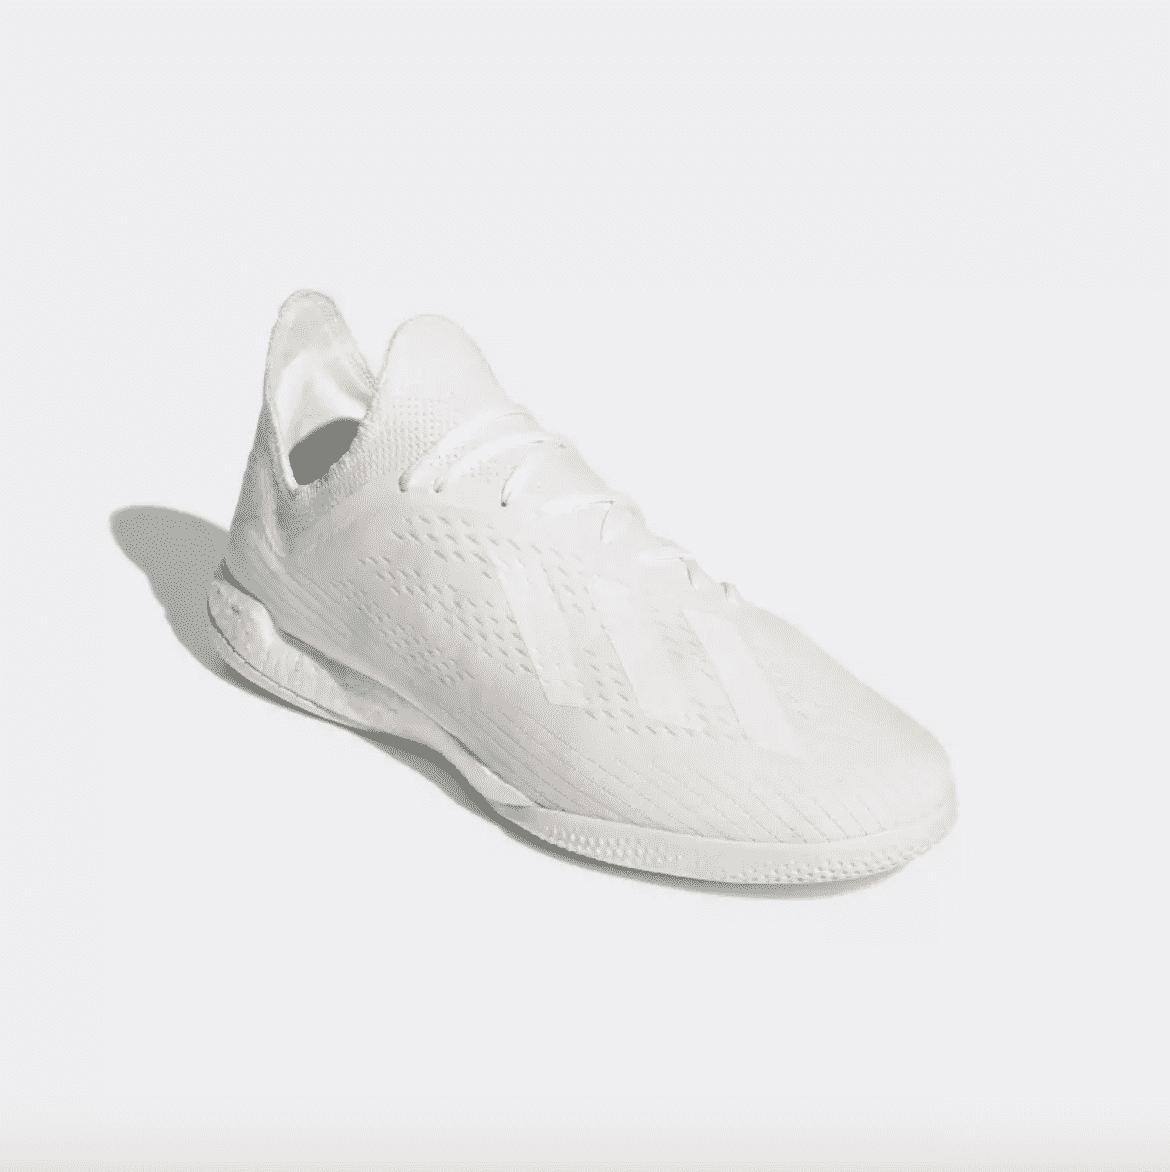 adidas-x18-tango-spectral-mode